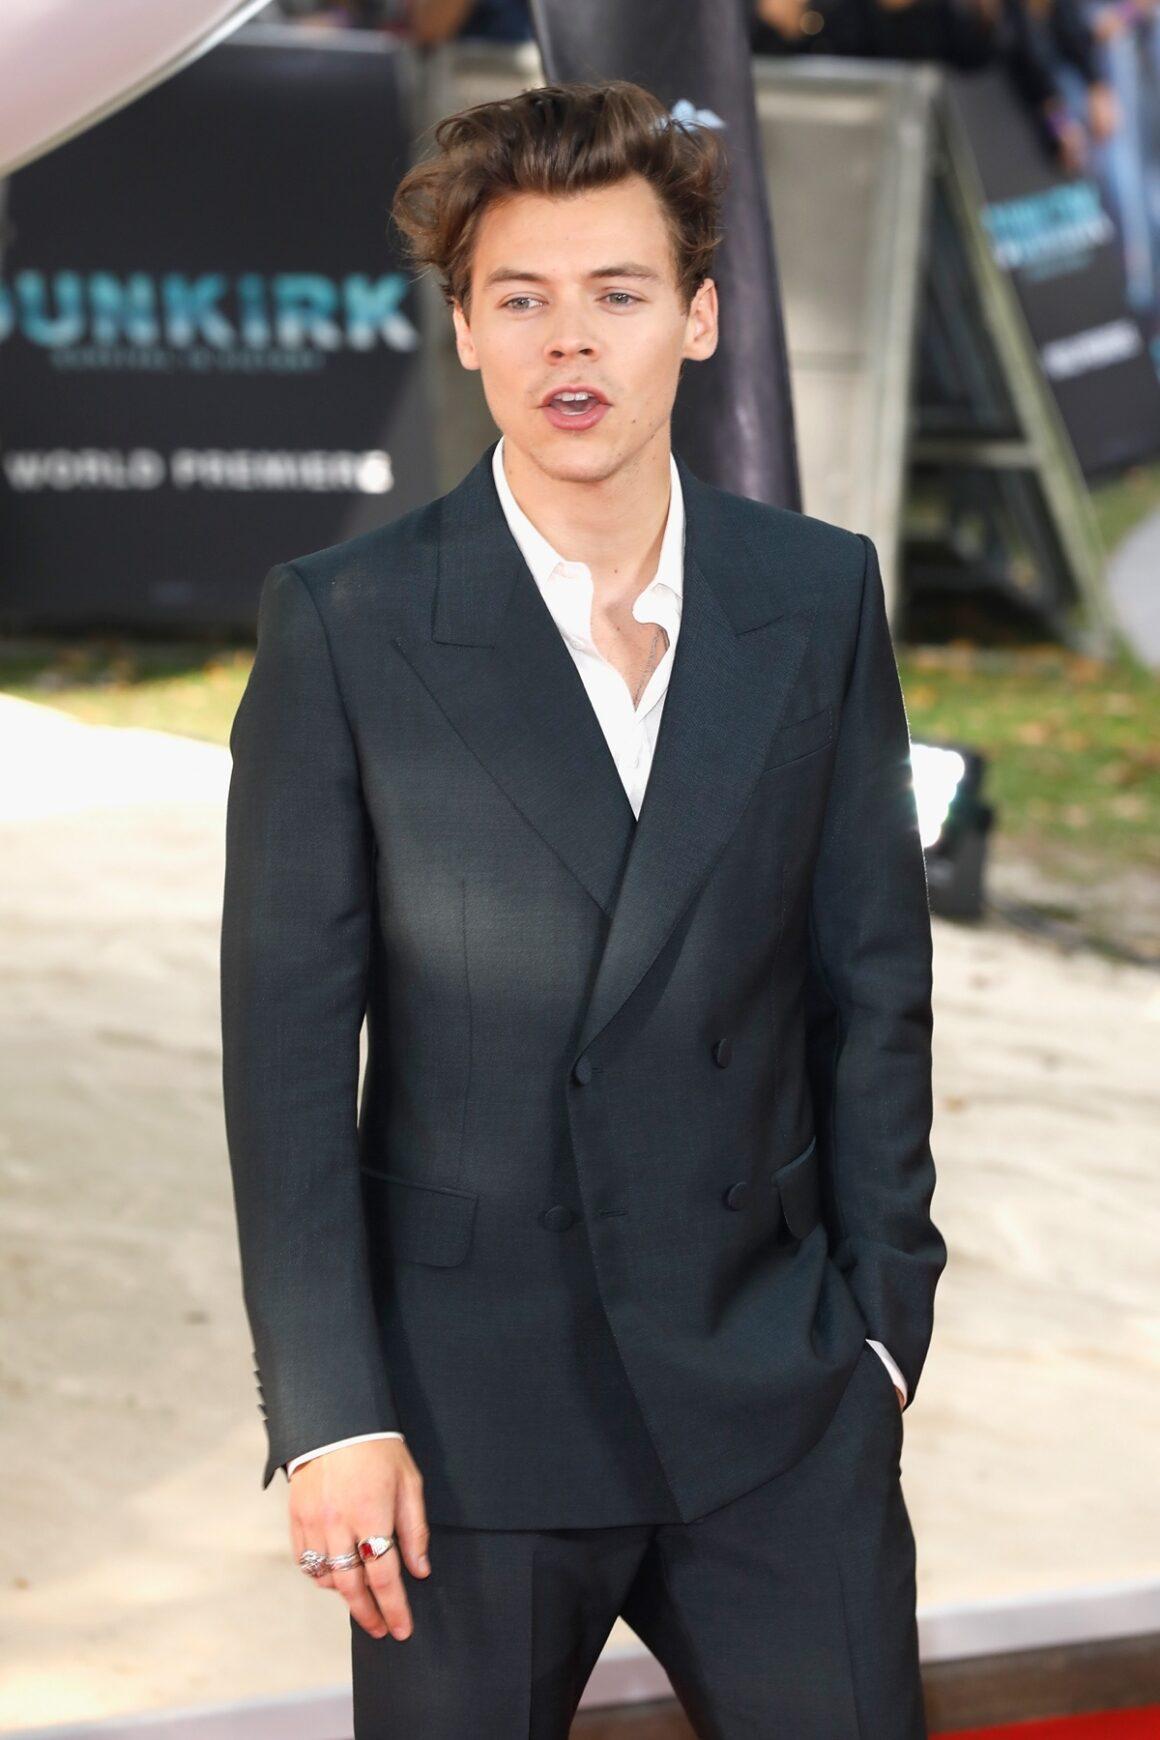 Harry Styles 'Dunkirk' World Premiere - Red Carpet Arrivals